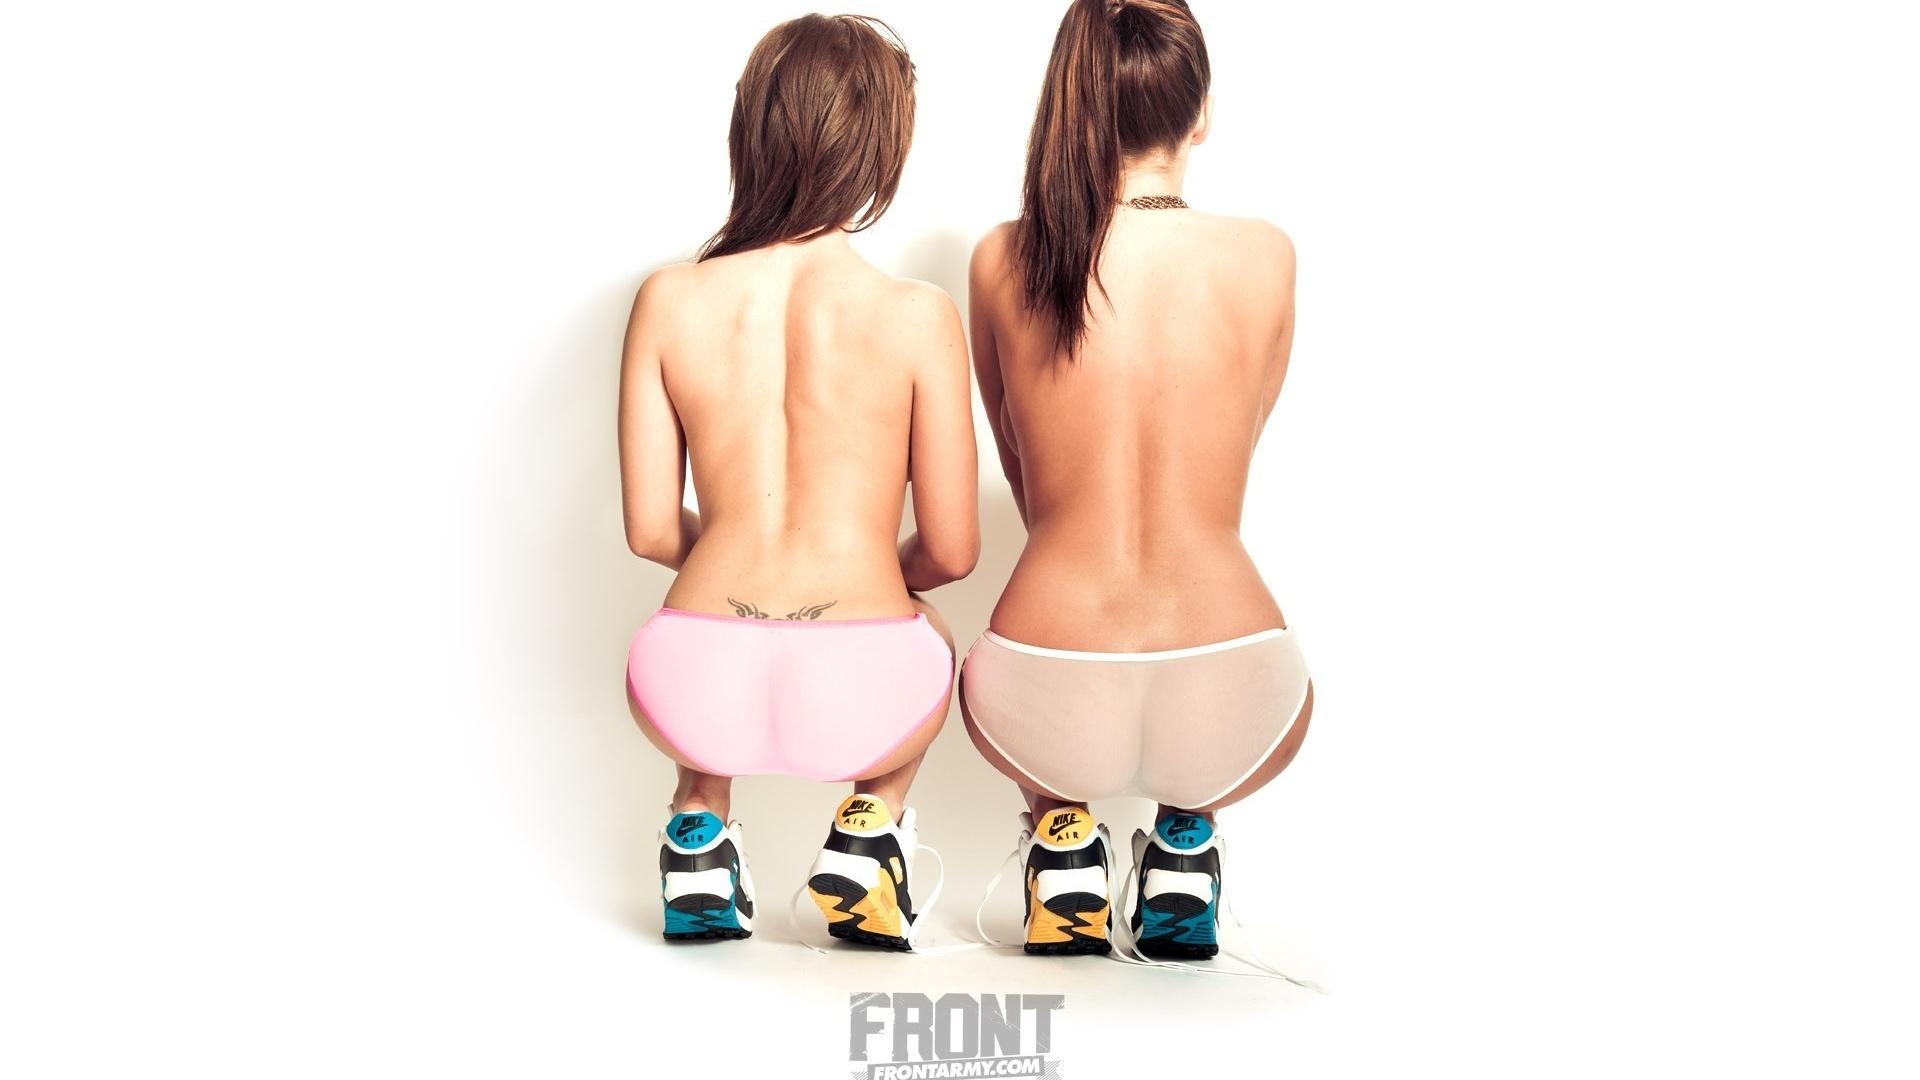 трусики, babes, модель, ass, позирует, попа, ножки, фигура